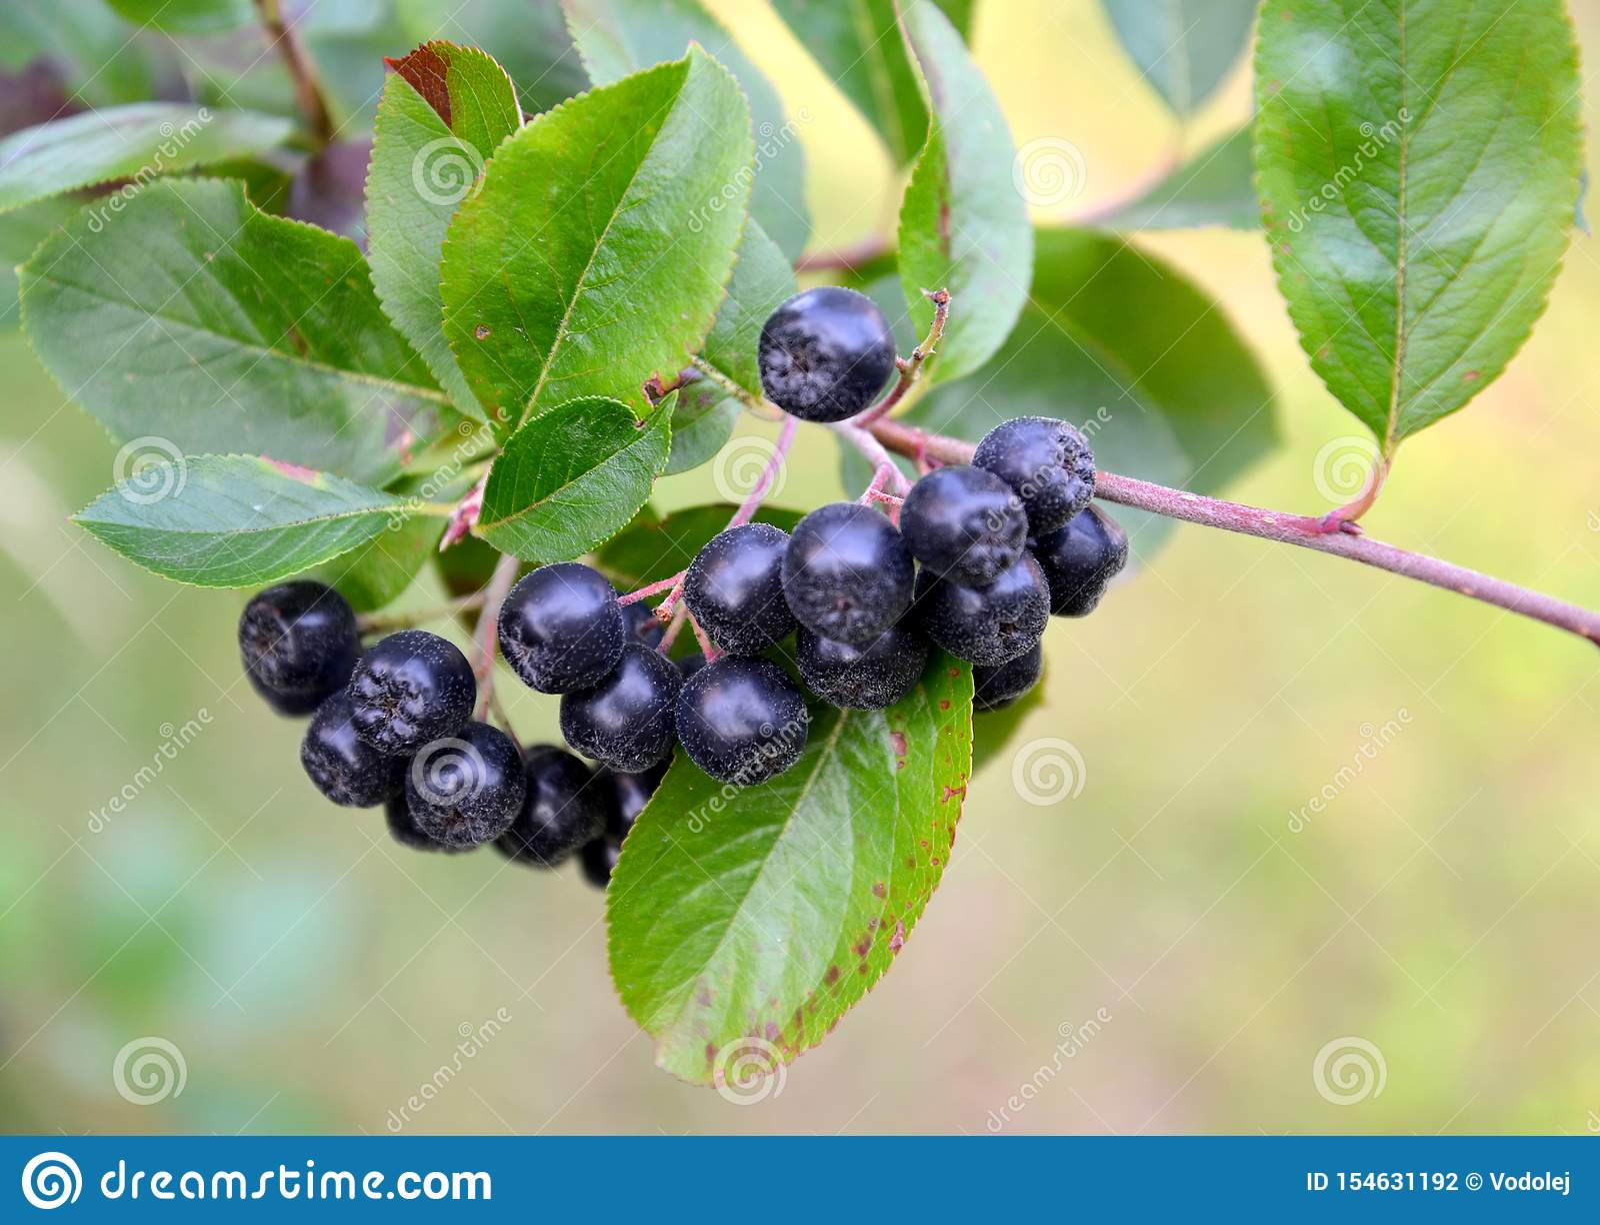 Berries of an aroniya mountain ash black-fruited Aronia melanocarpa Michx. Elliott close up